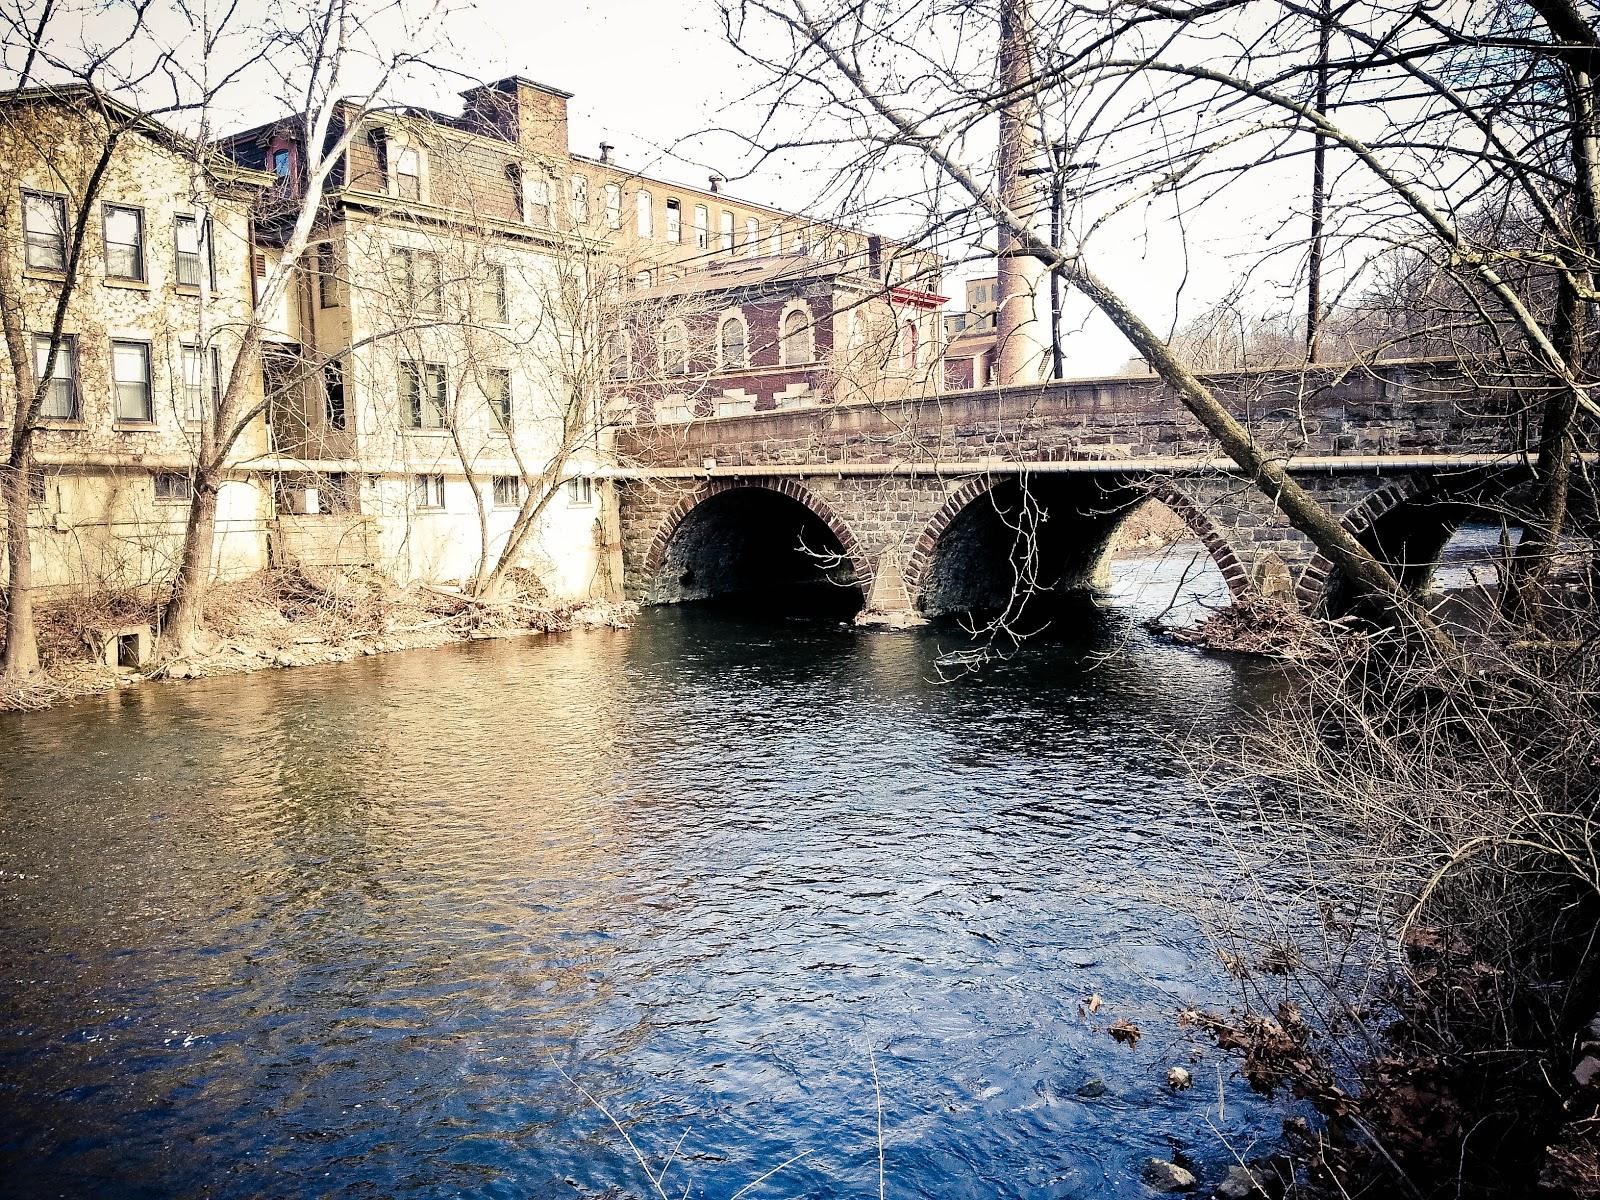 Pocono fly fishing bushkill creek easton pa jan 19 2013 for Fishing creek pa